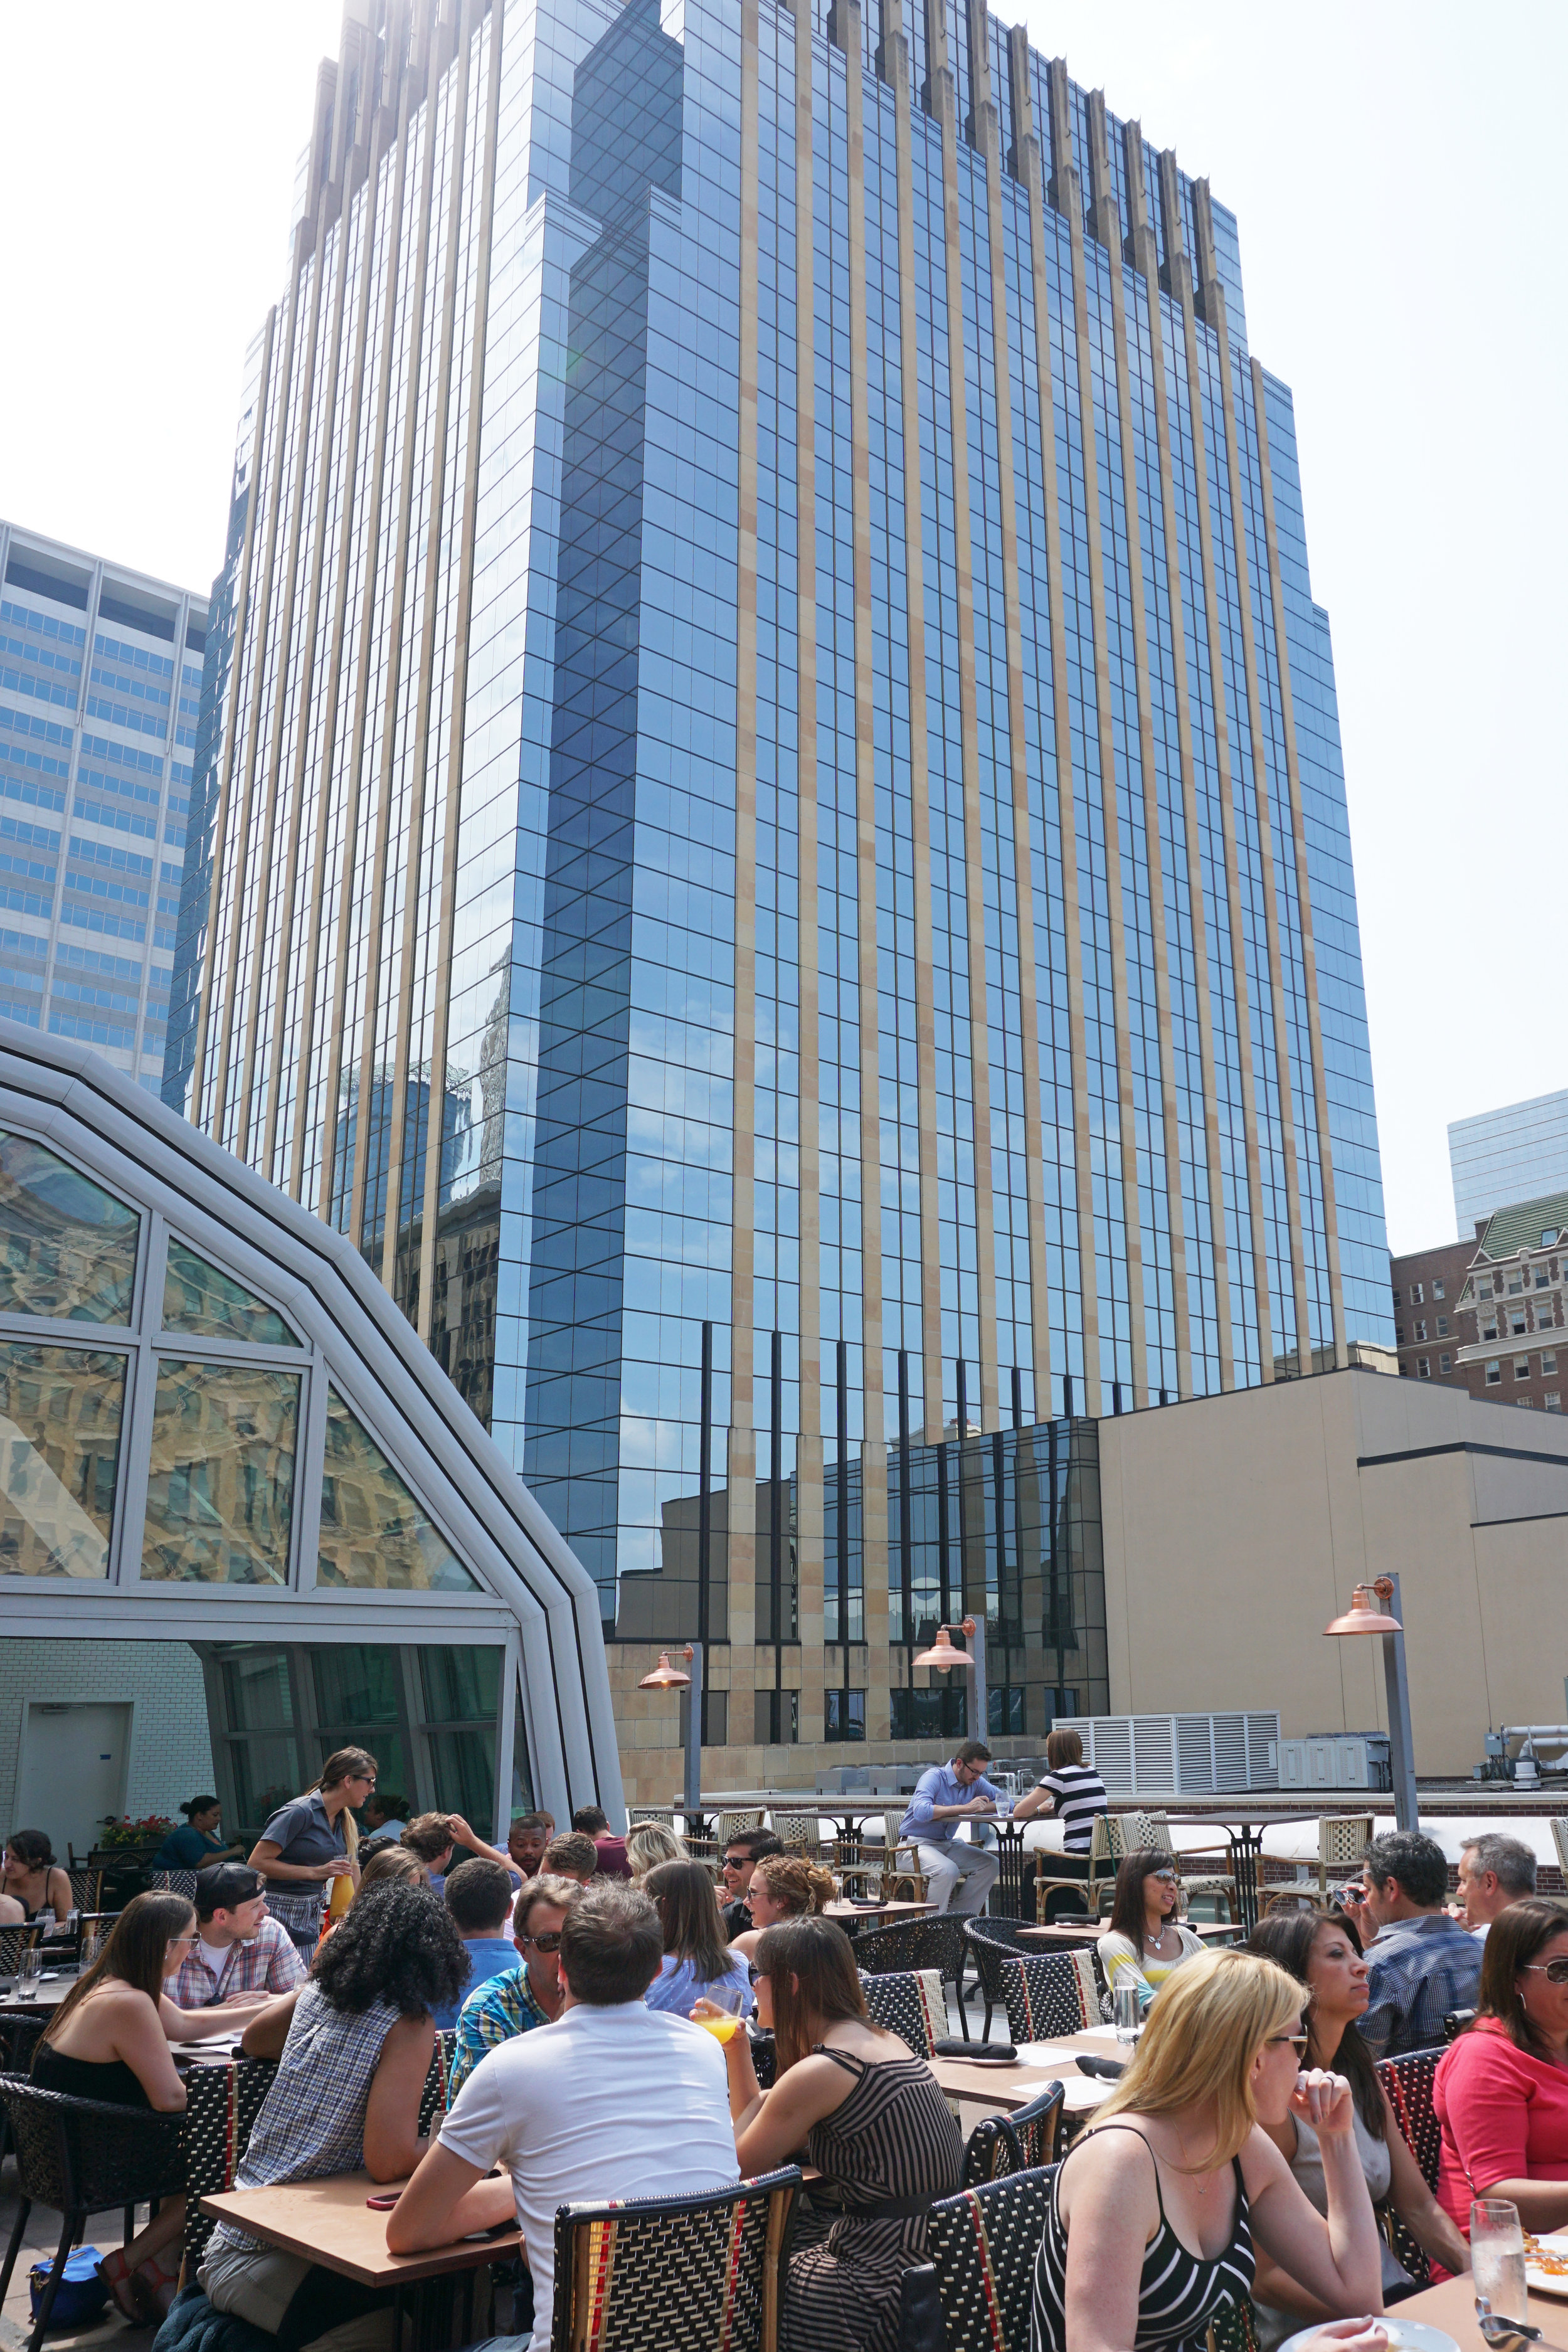 union-rooftop-minneapolis-02.jpg